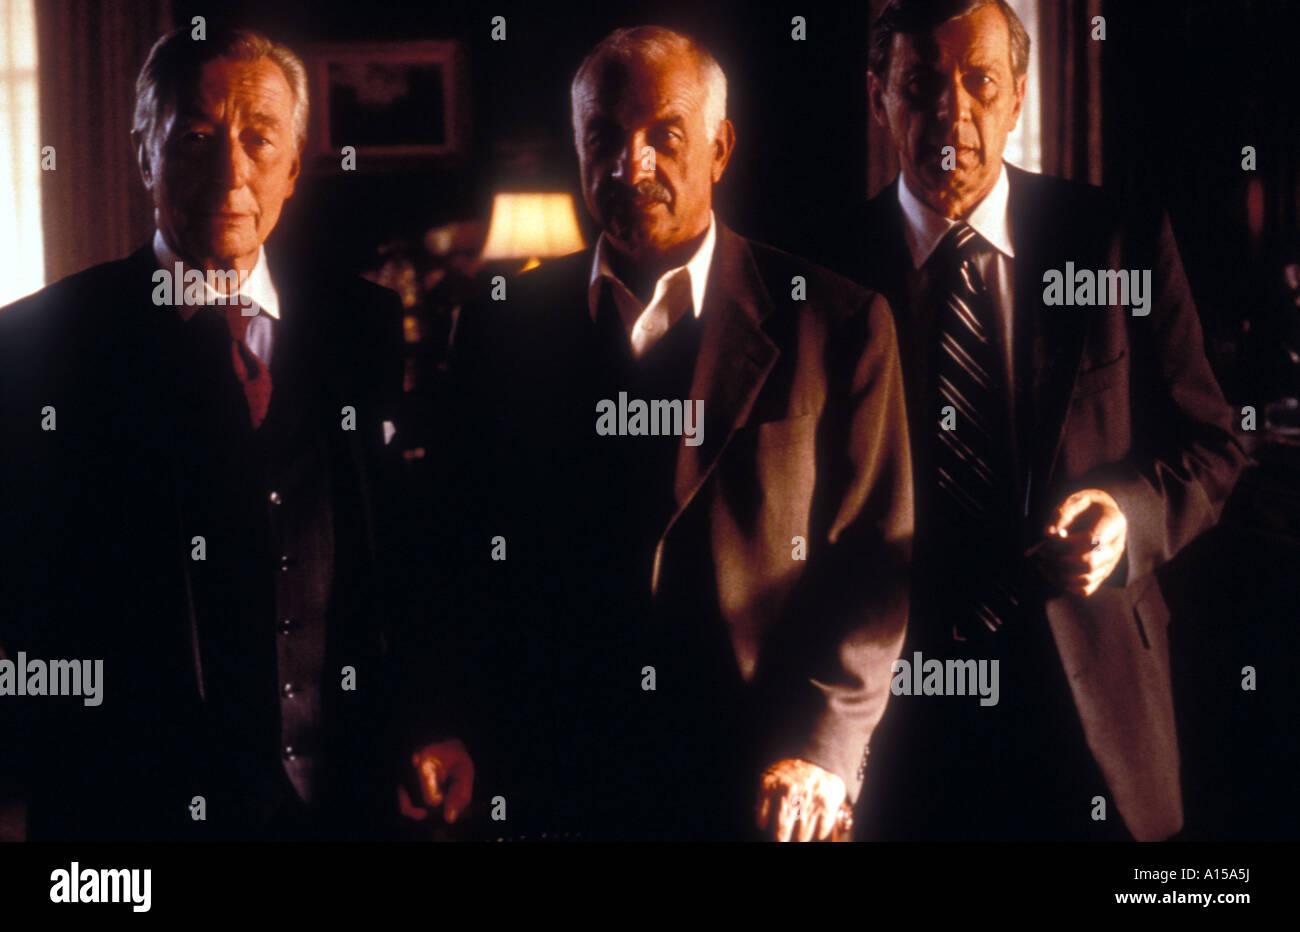 The X Files The Movie Year 1998 Director Rob Bowman John Neville Armin Mueller Stahl William B Davis - Stock Image